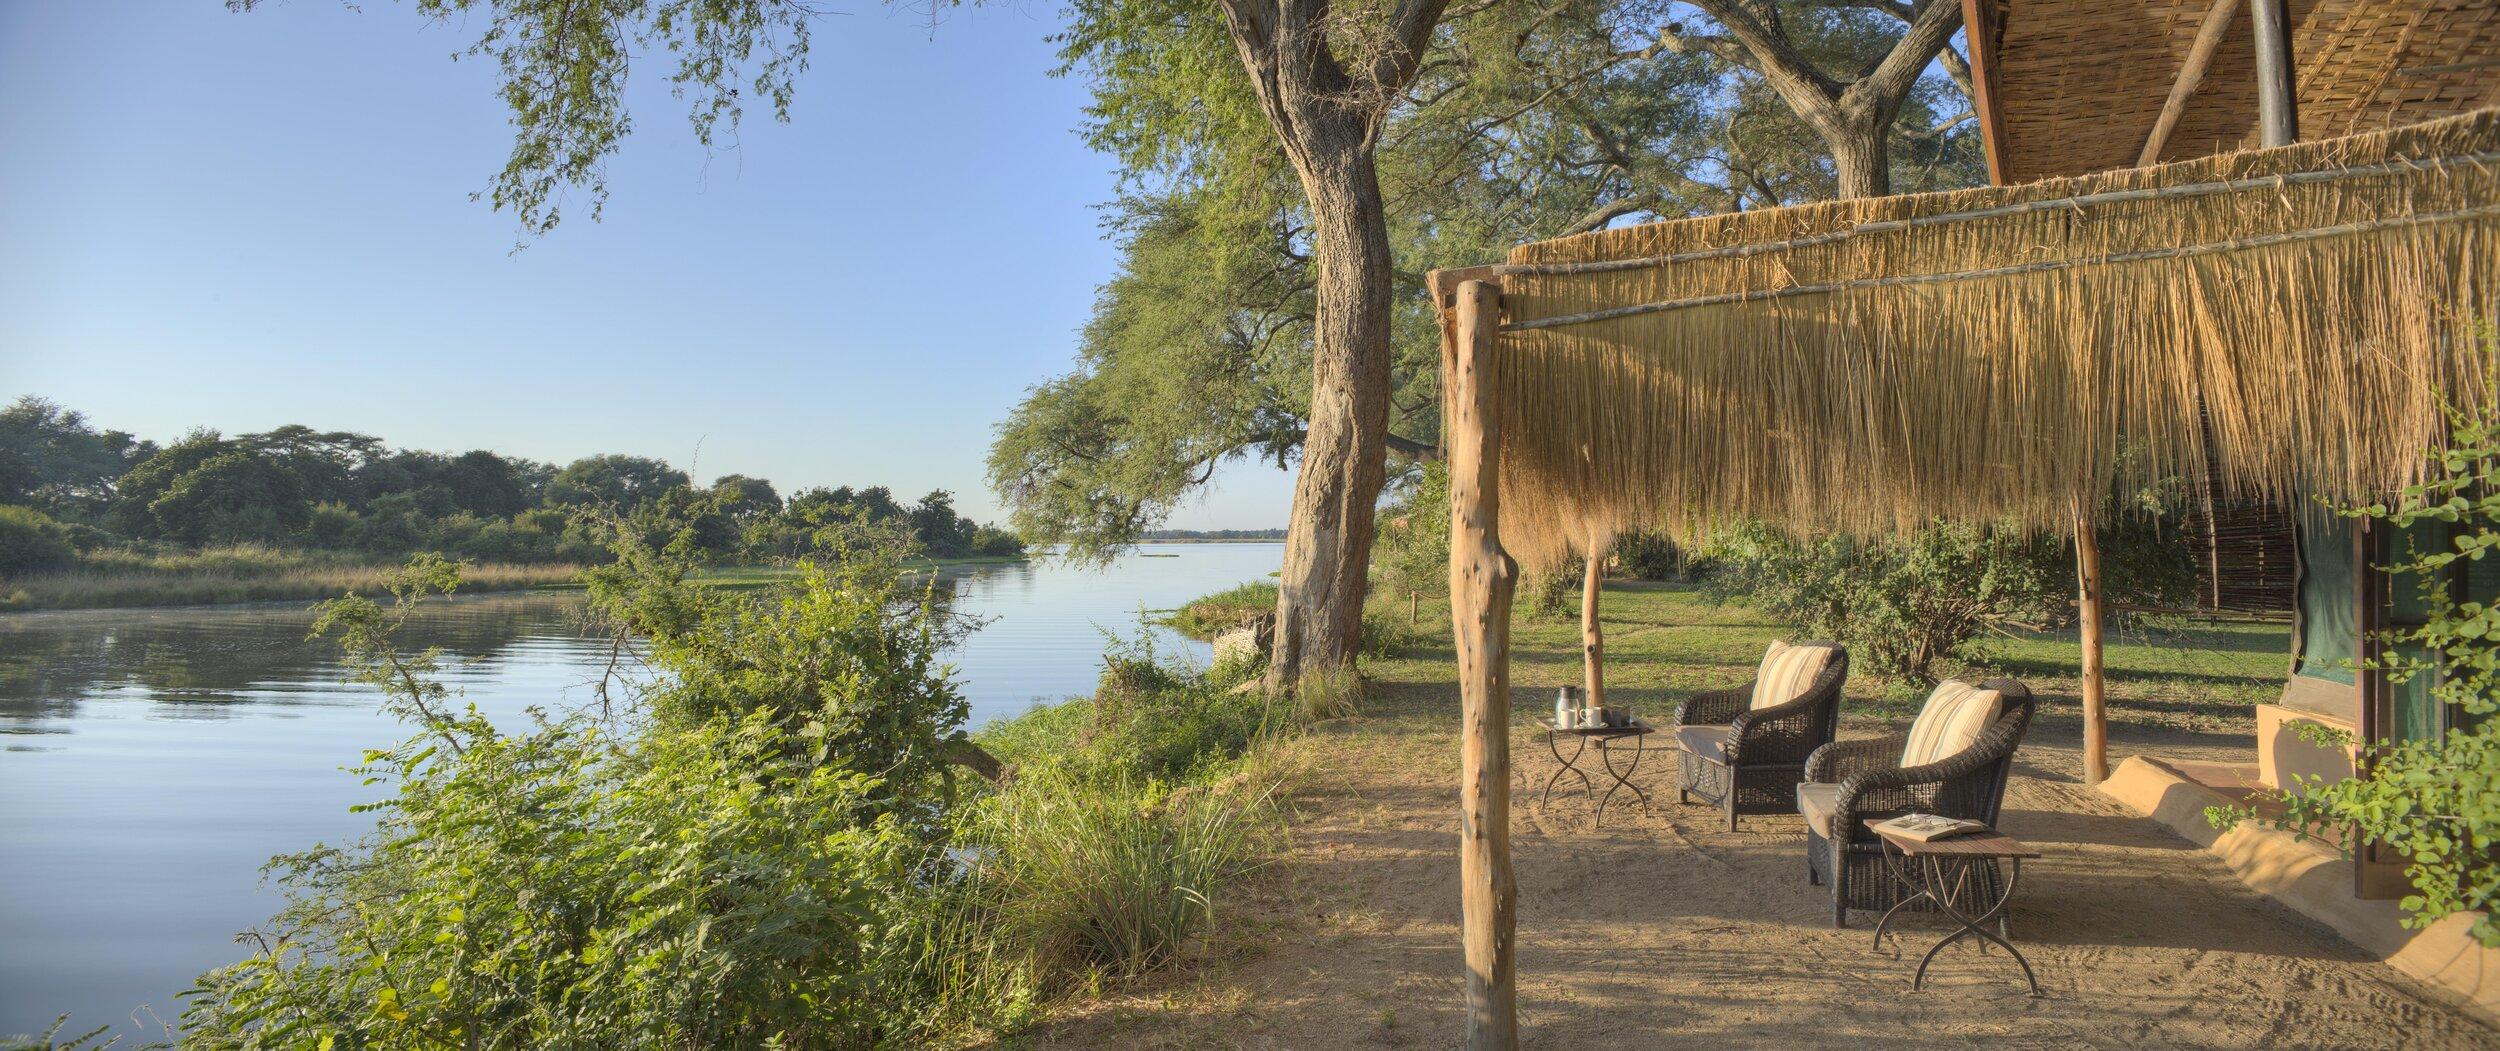 time + tide - chongwe river camp